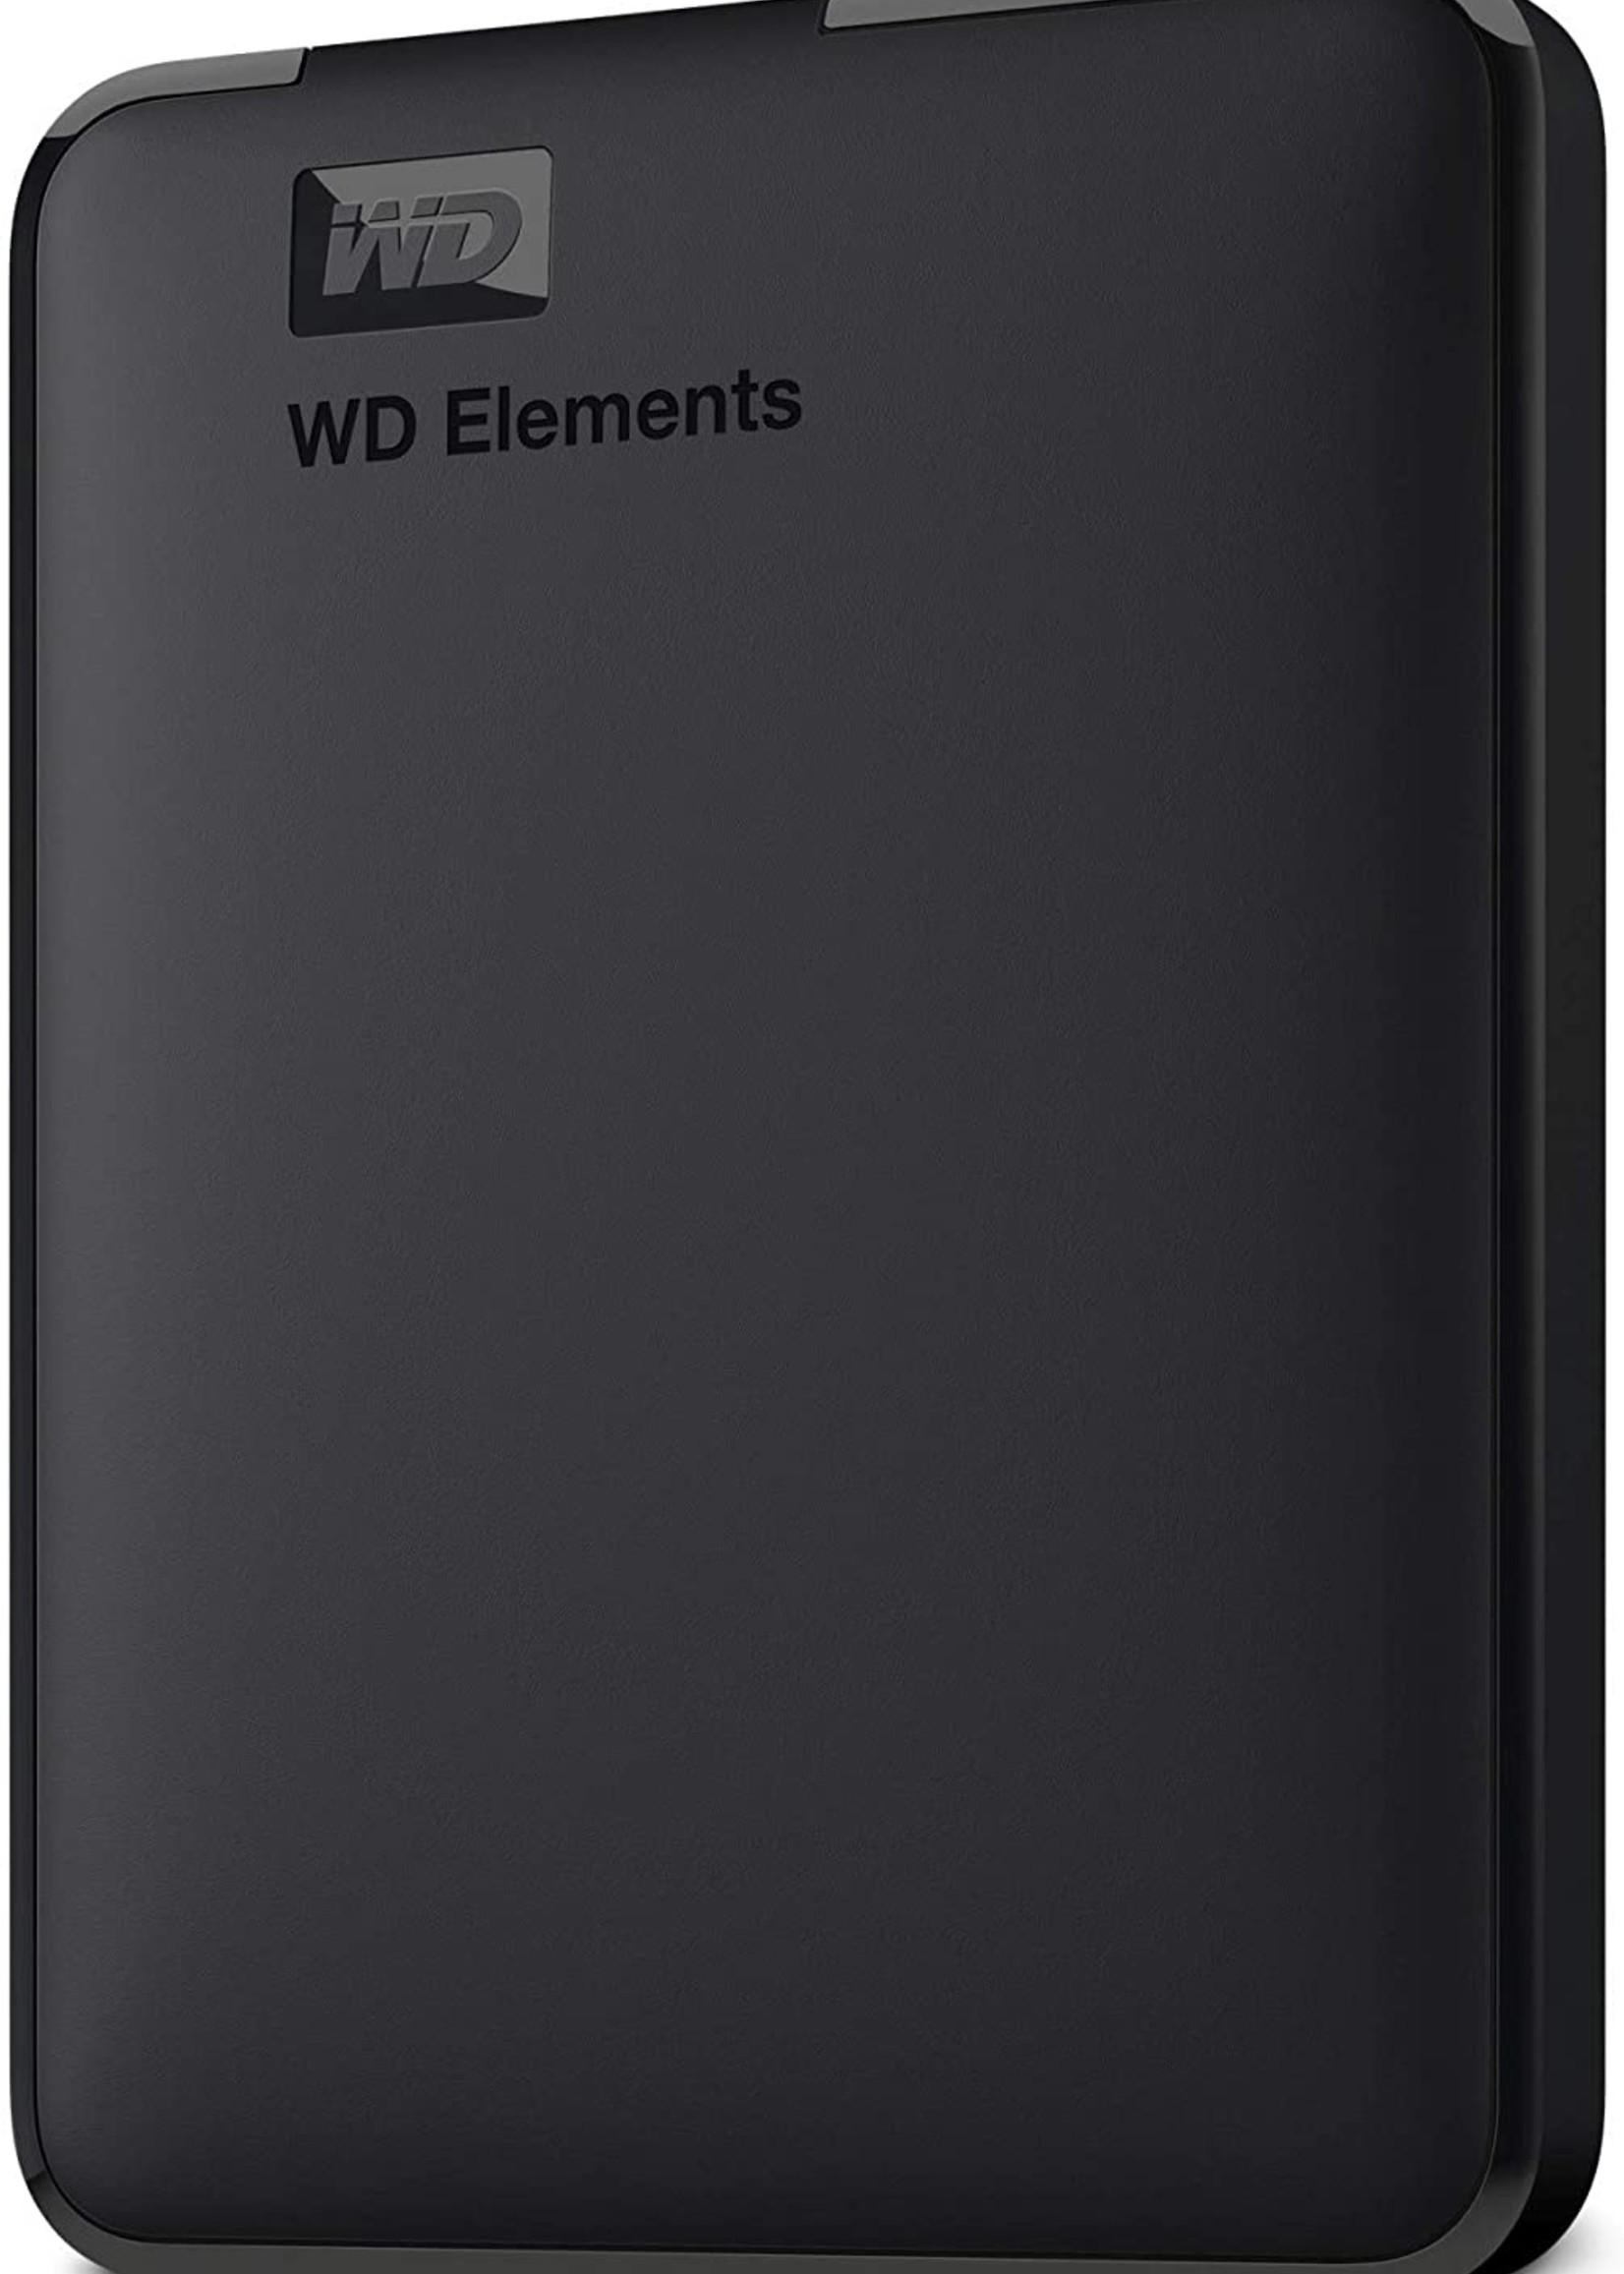 Western Digital 2TB WD Elements External USB 3.0 HHD